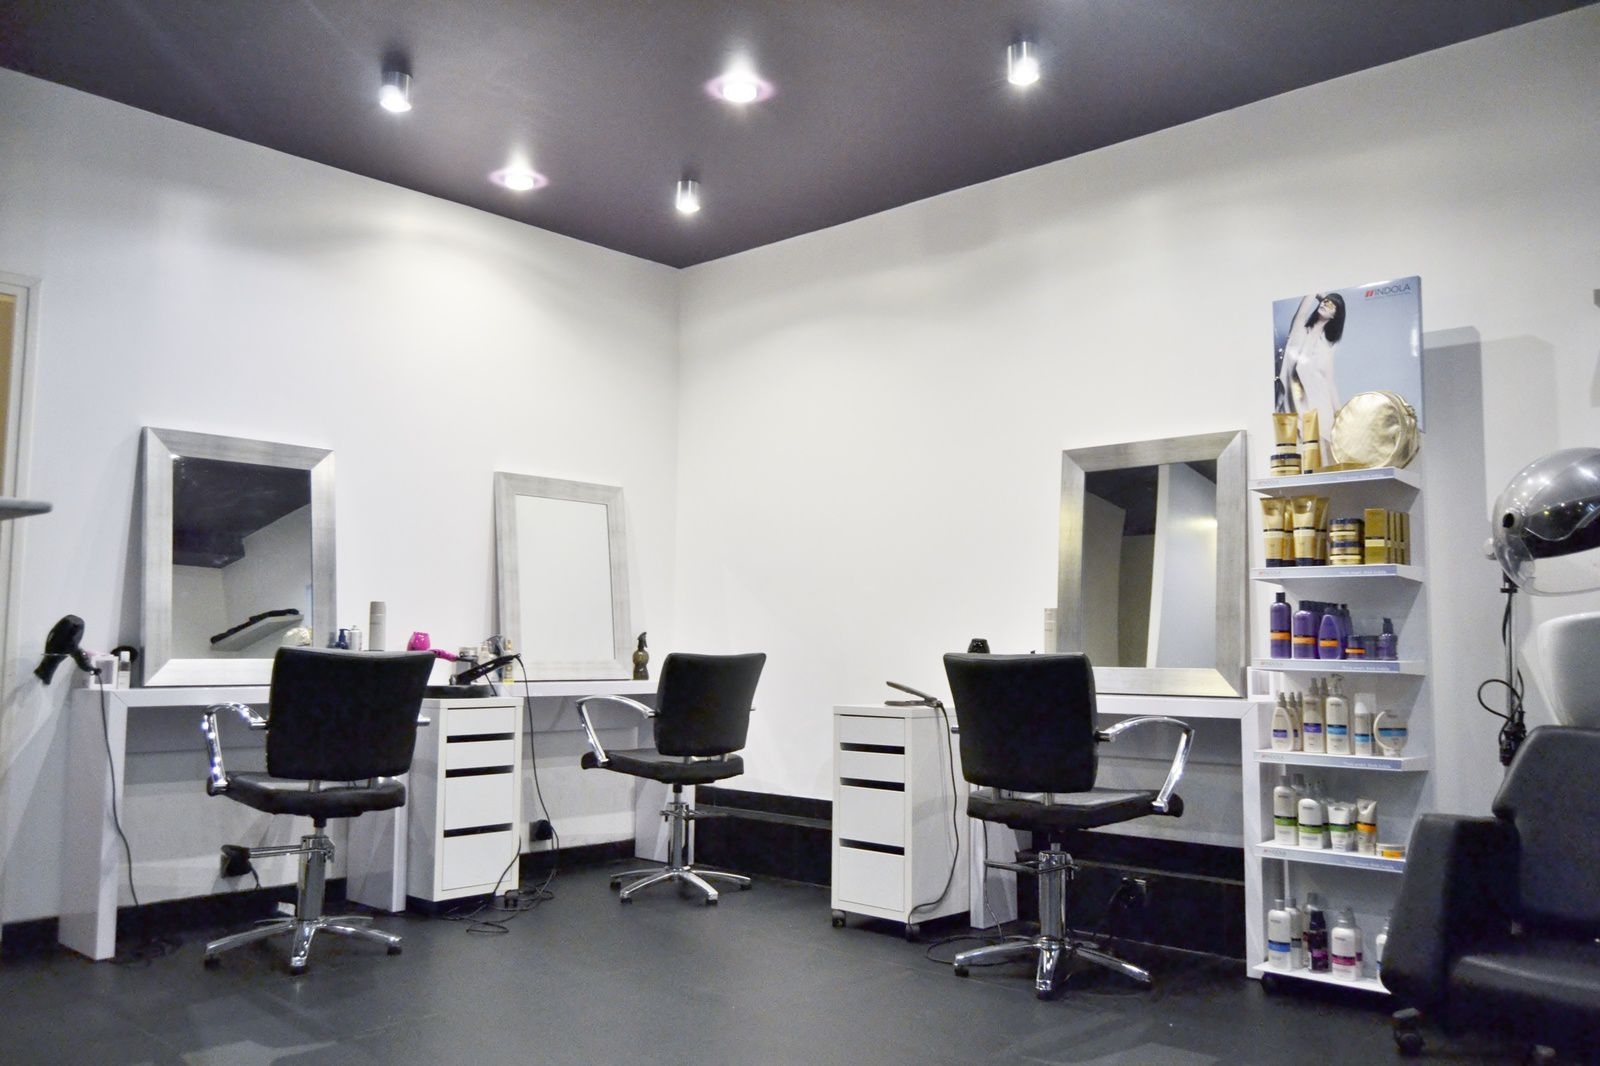 Salon de coiffure dreadlocks a reims Coiffure chignon mariage cheveux fins Tendance cfmgok